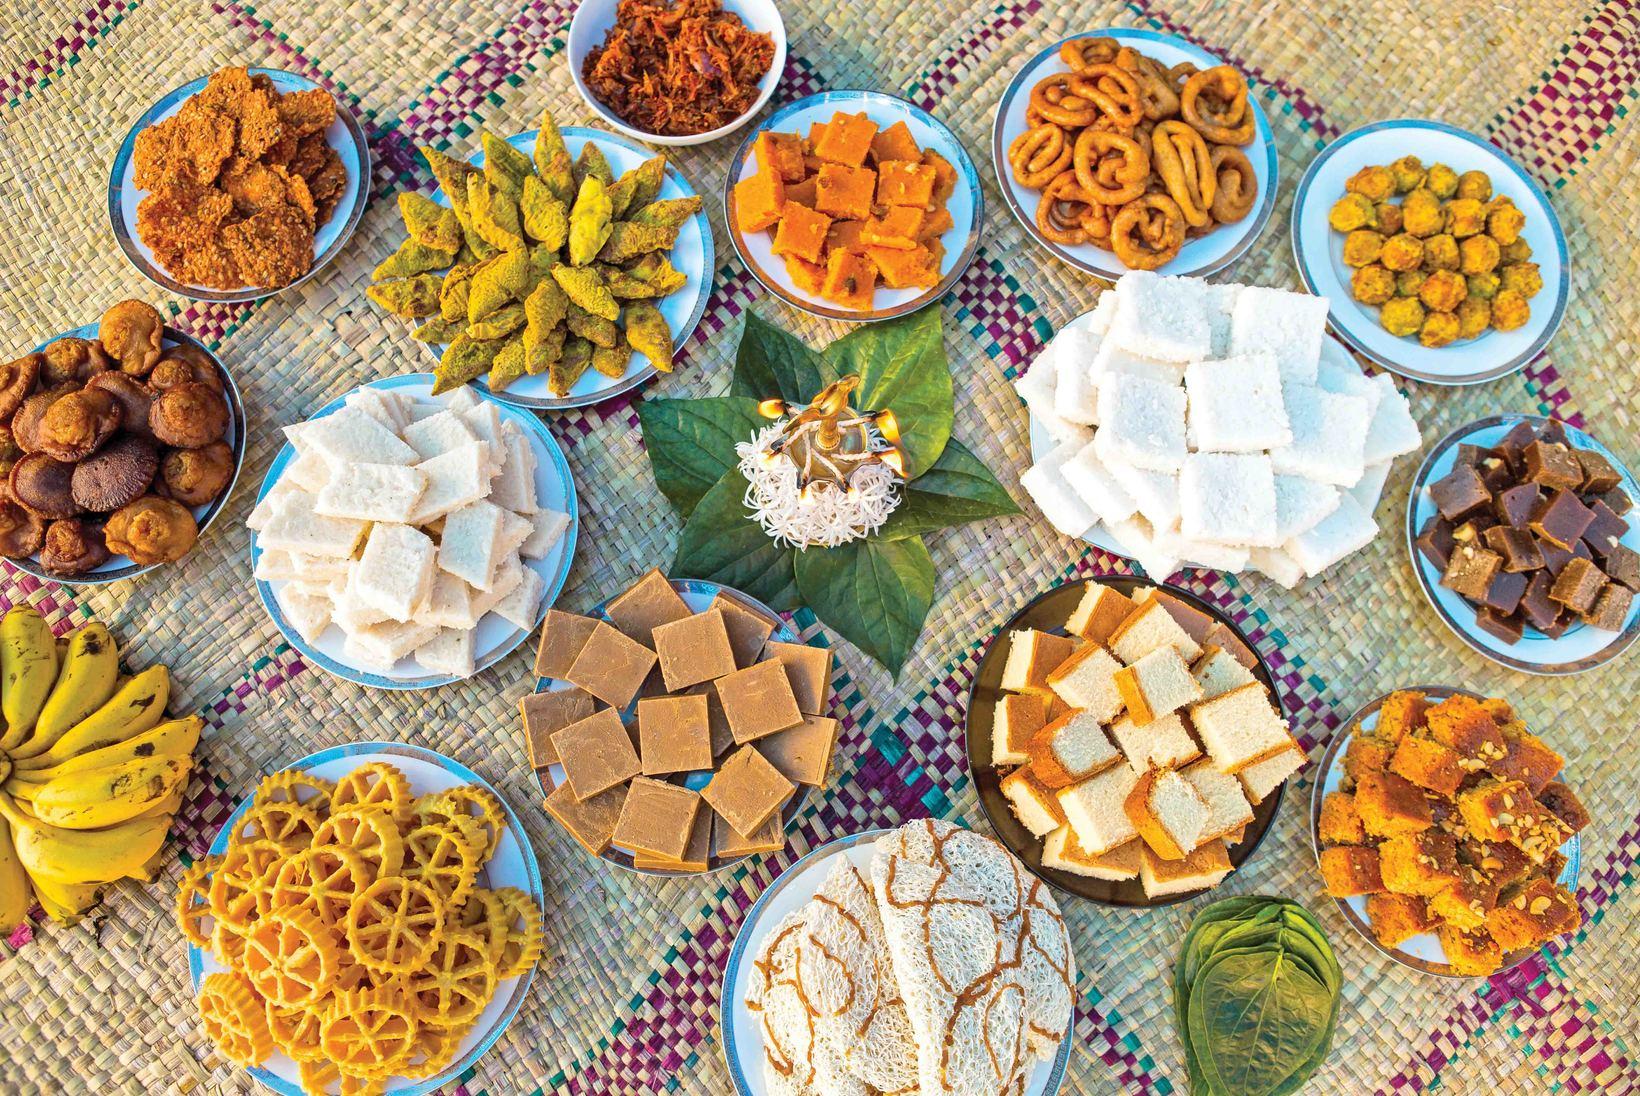 Sinhala and Tamil New Year ❤️ අලුත් අවුරුද්ද ❤️ புத்தாண்டு - Lakpura™